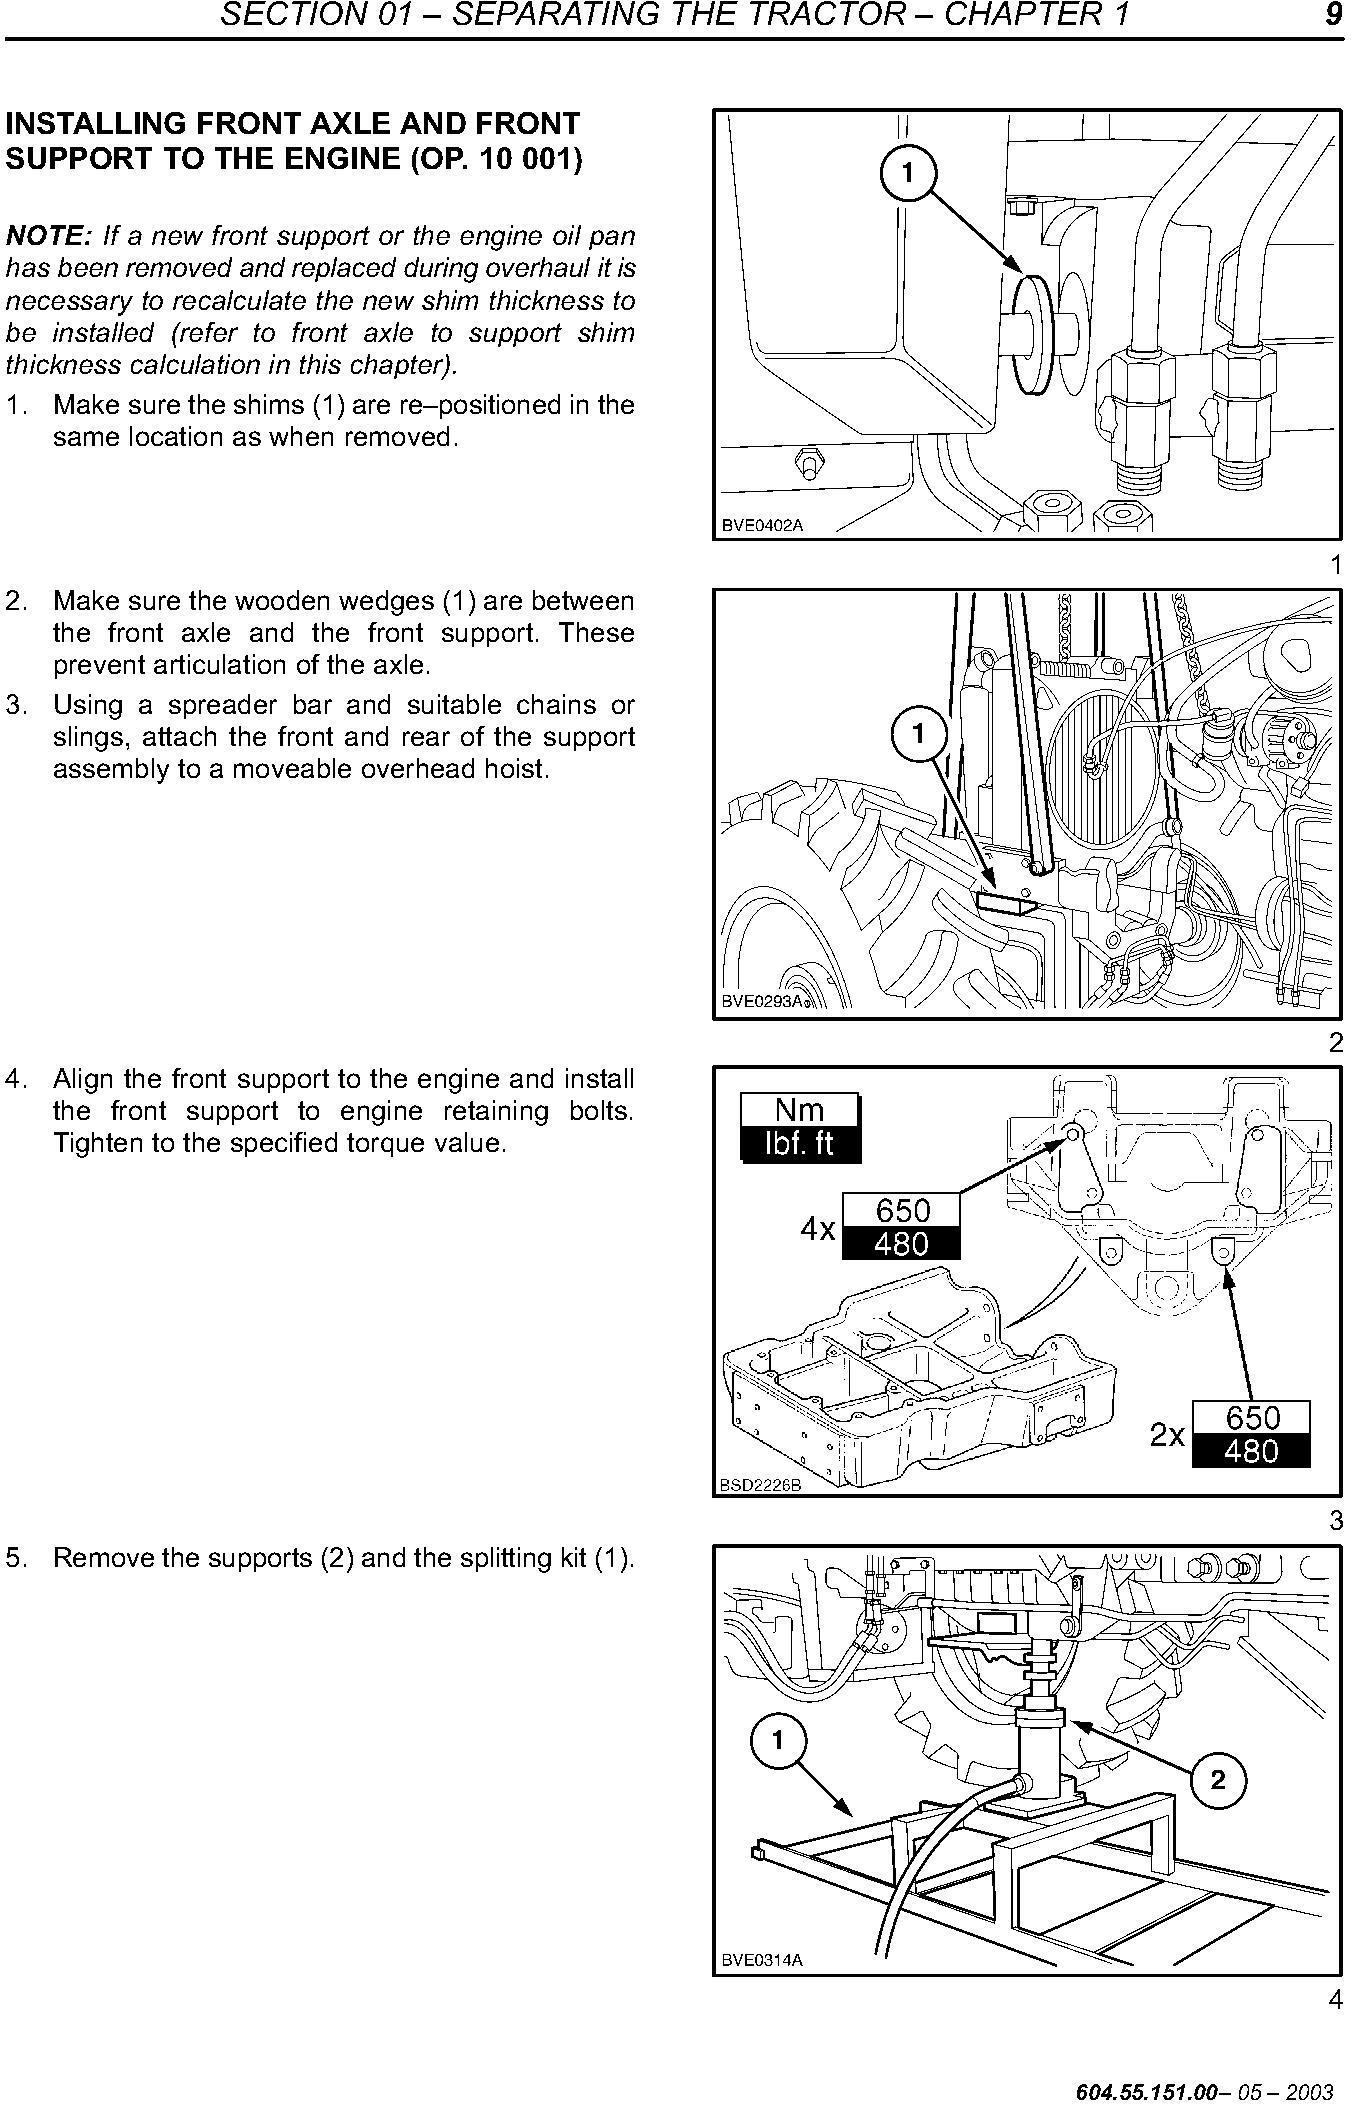 New Holland TS100A, TS110A, TS115A, TS125A, TS130A, TS135A Service Manual - 1